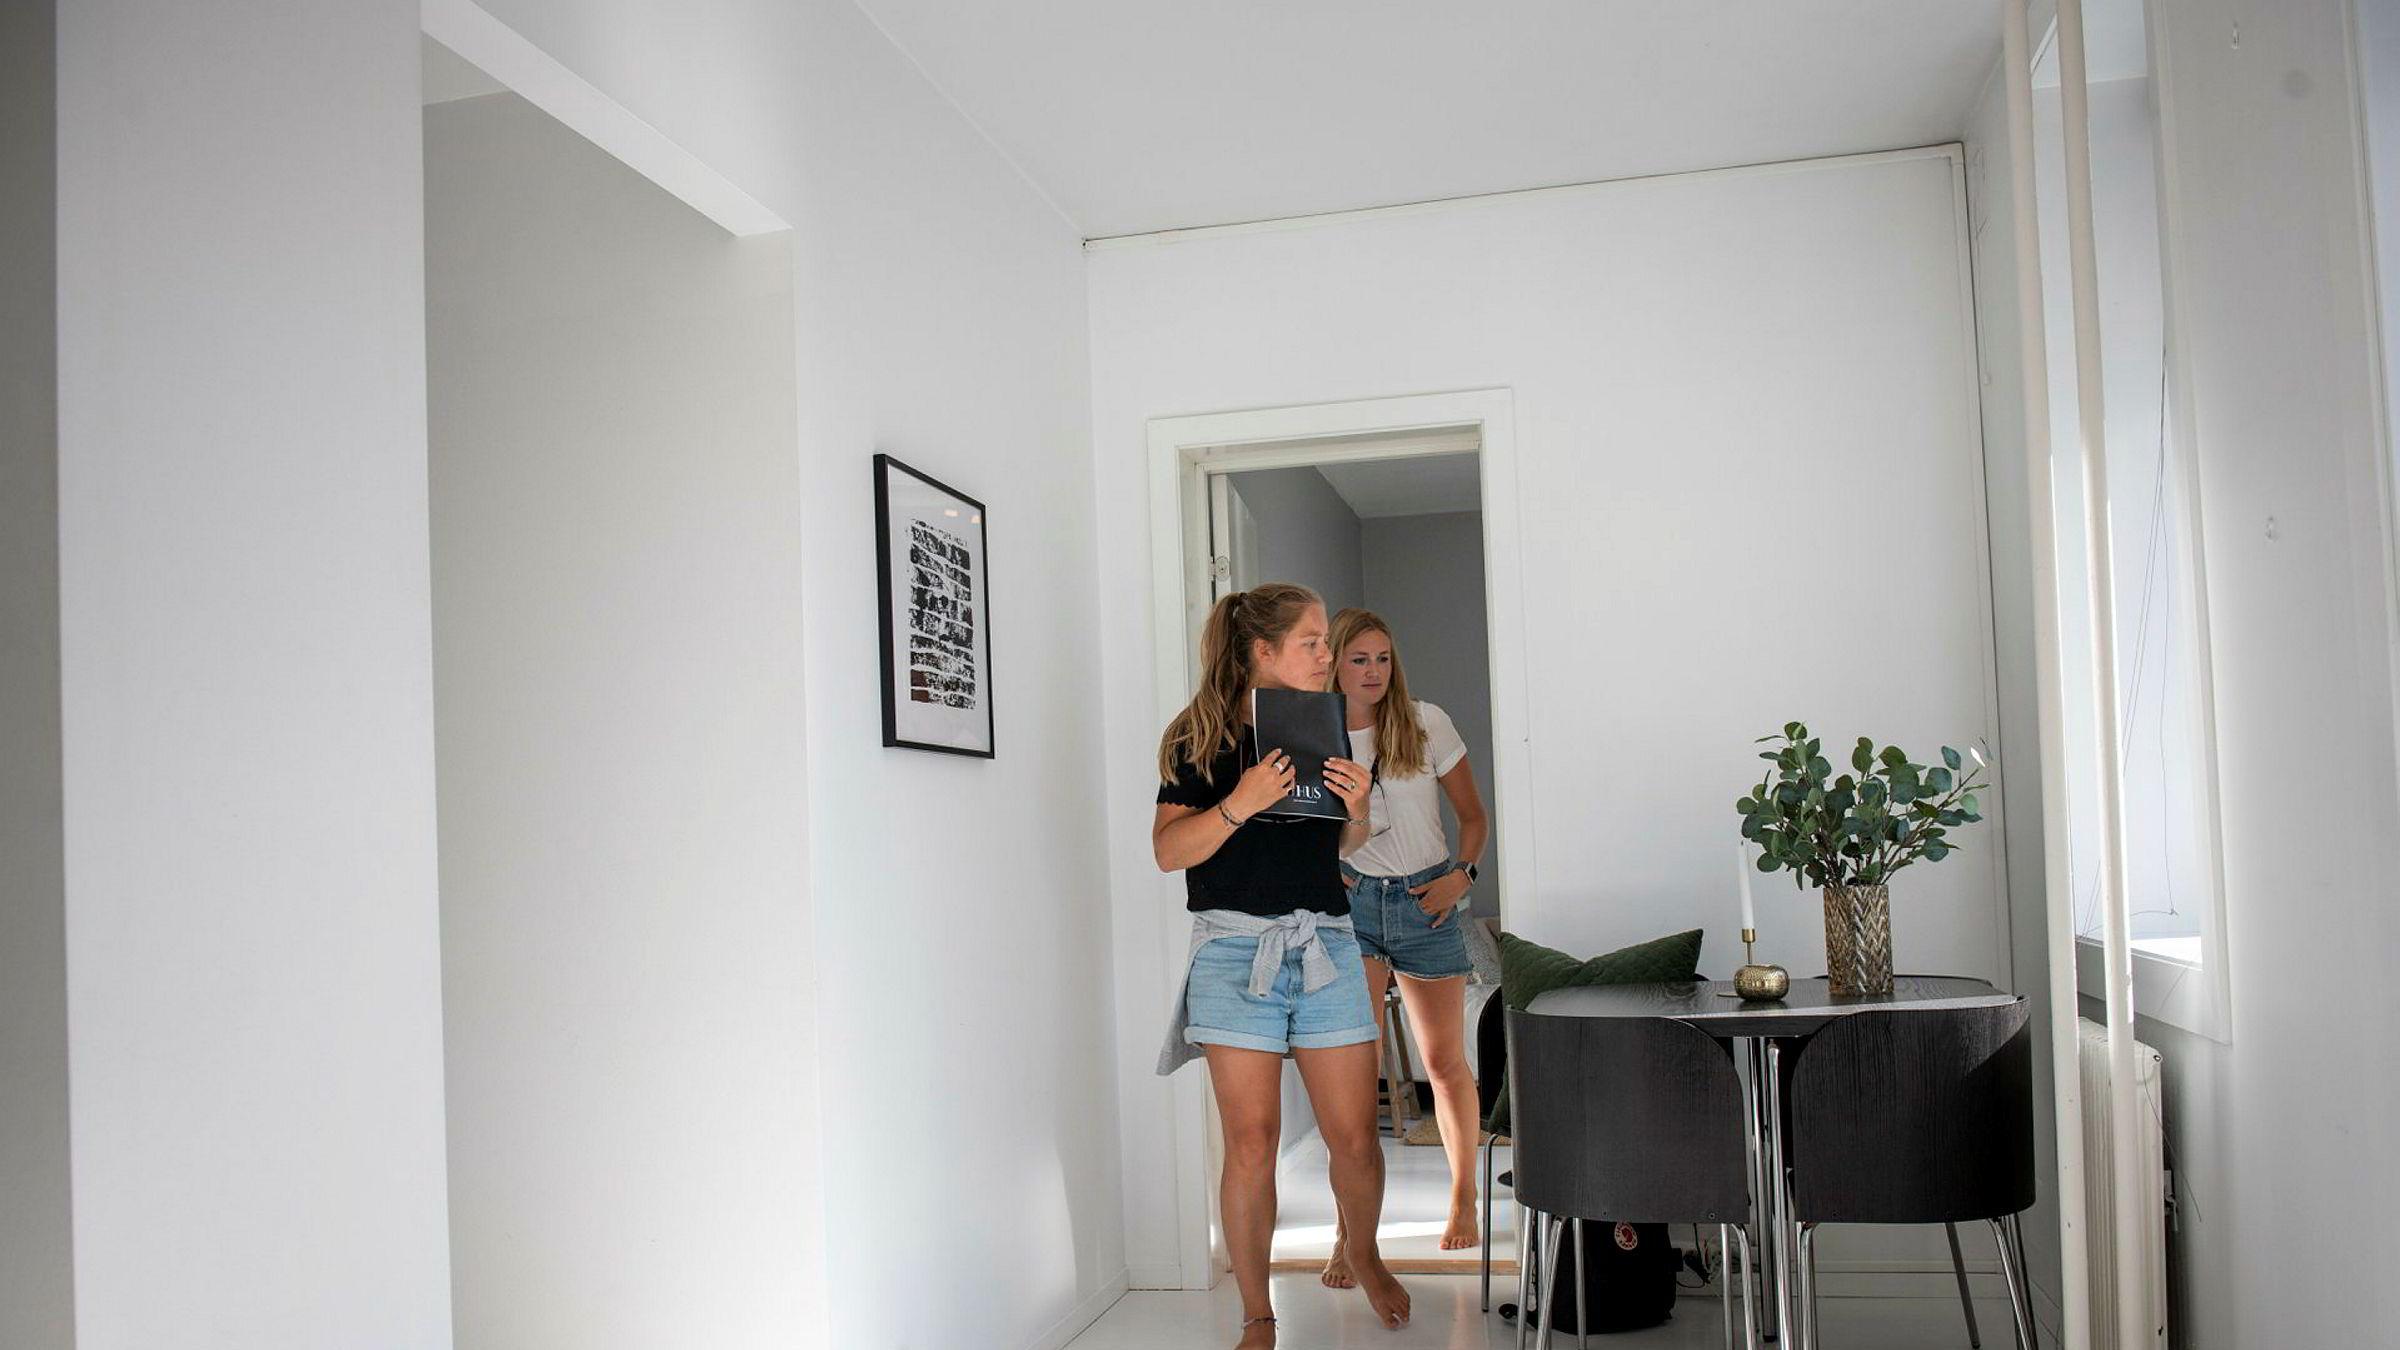 Boligsøker Oda Lassen-Urdahl har med venninnen Oda Omre som moralsk støtte på visning.